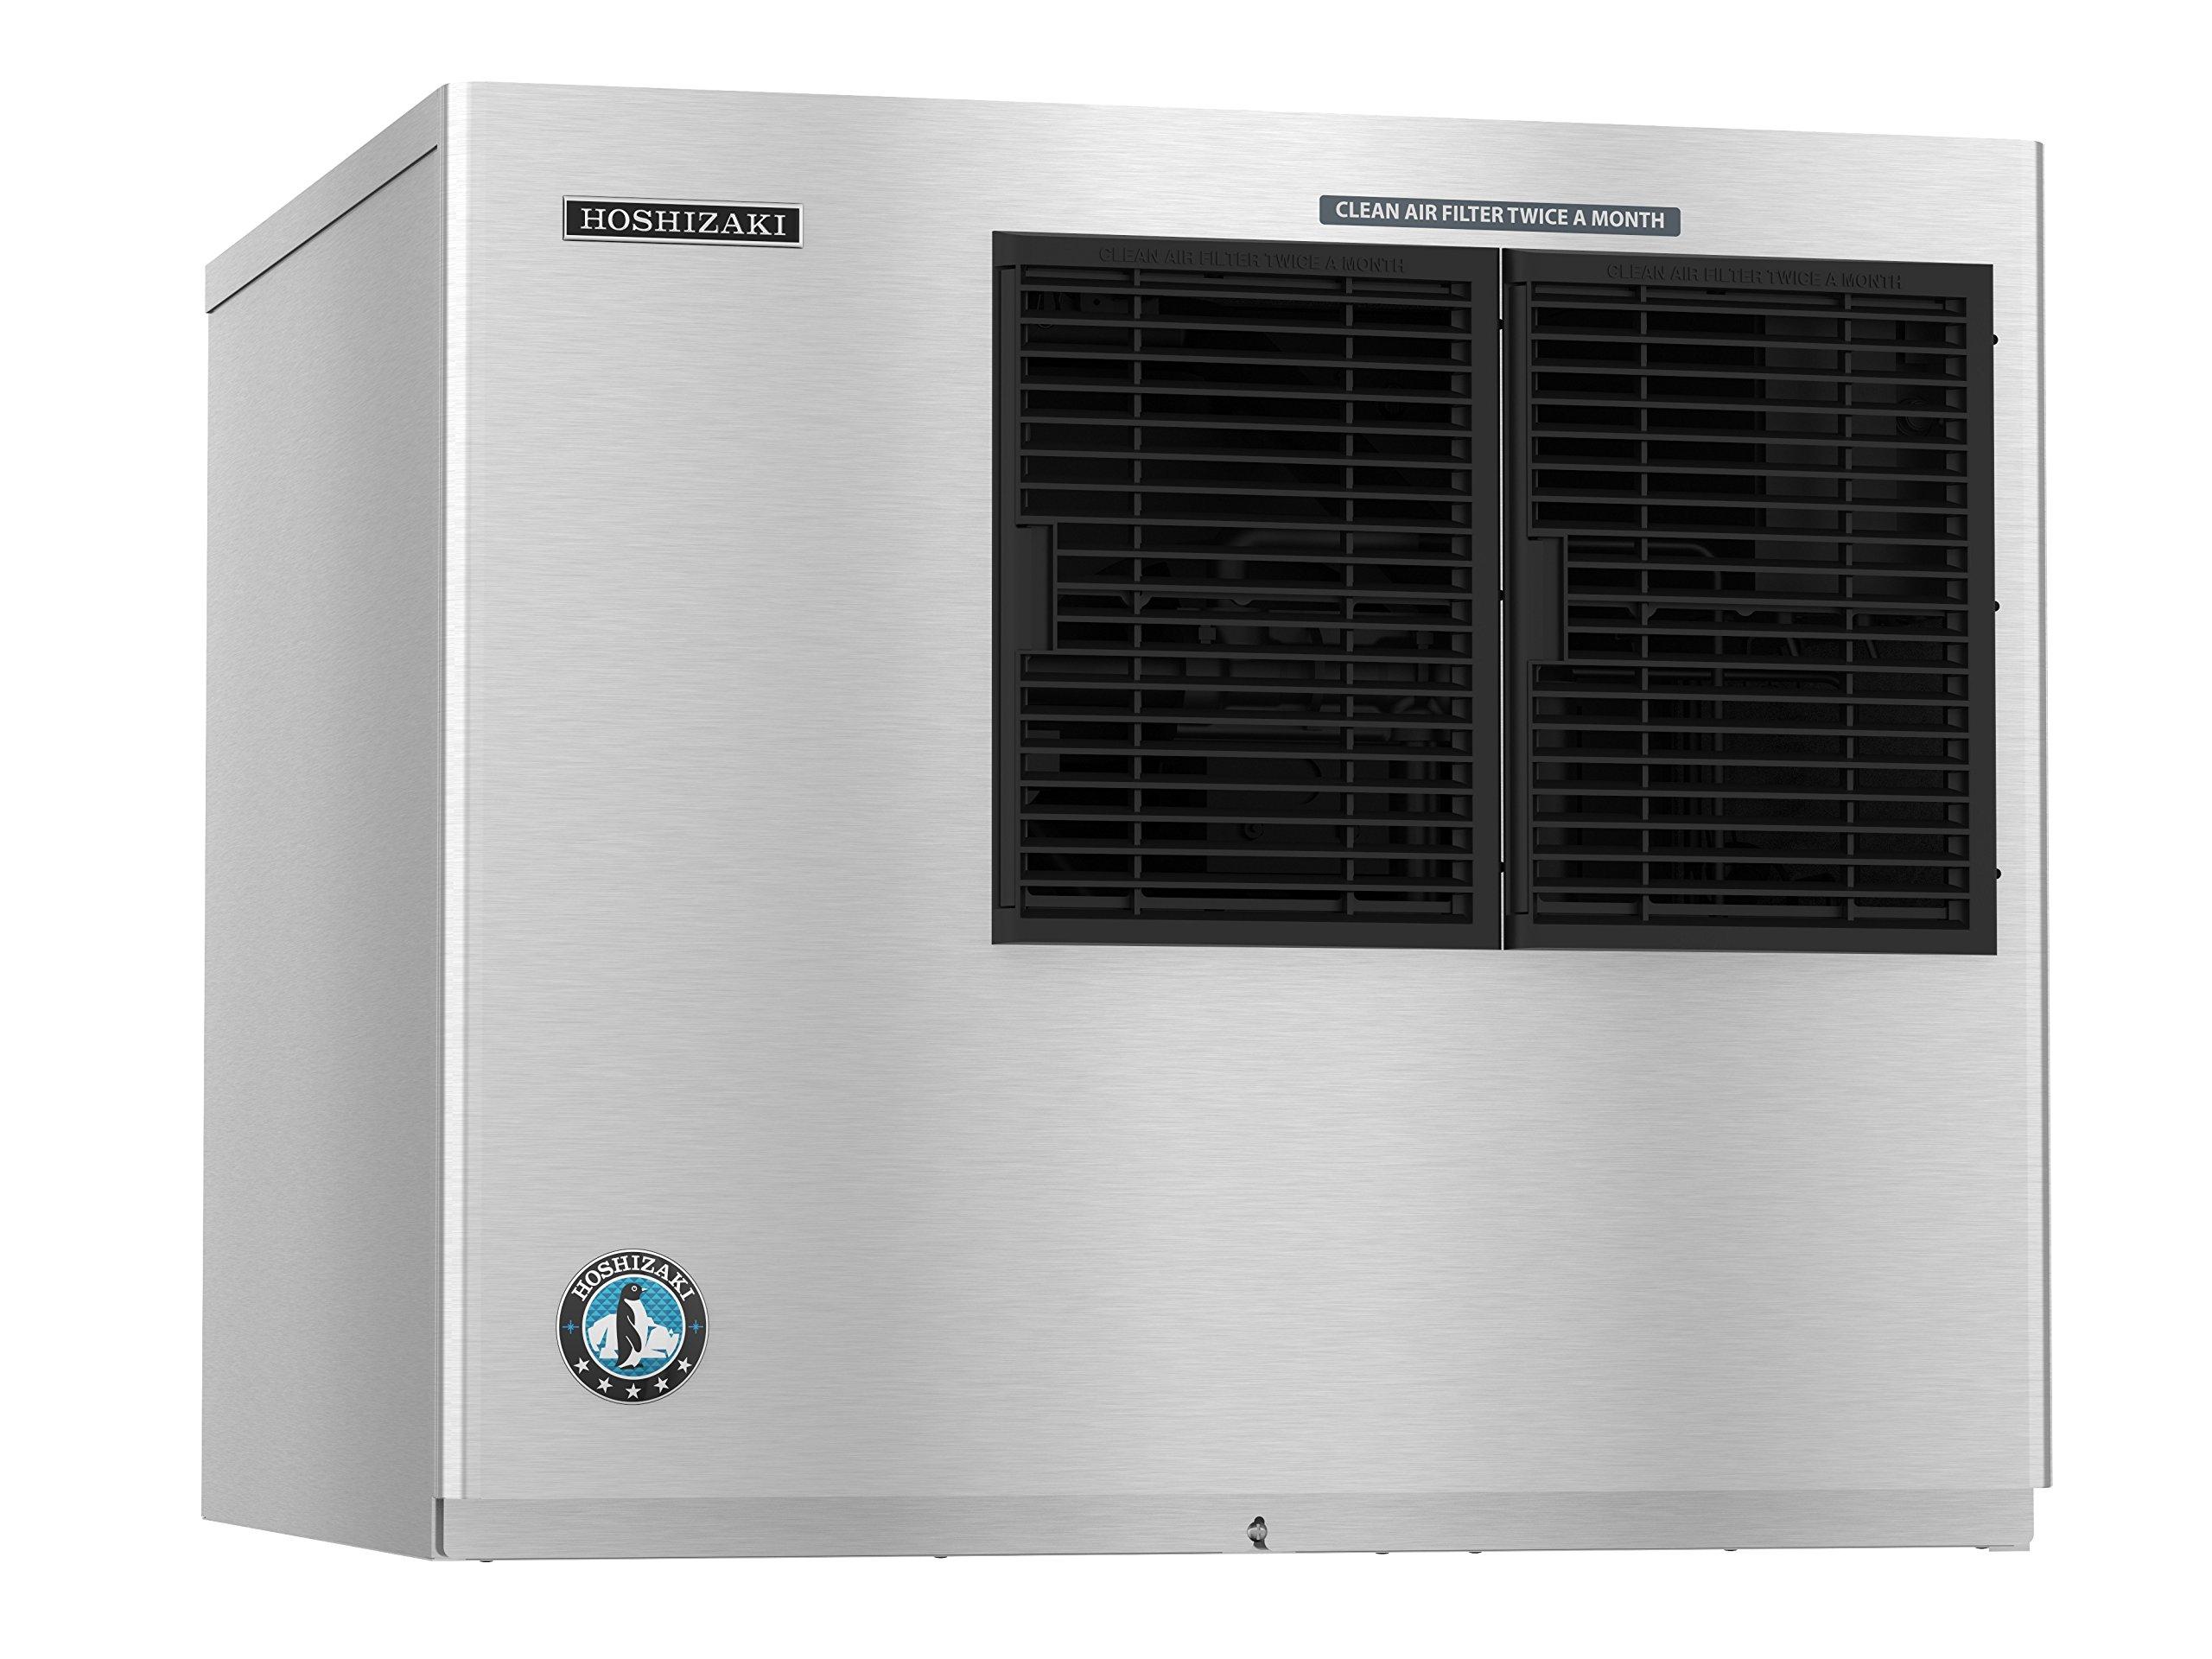 Hoshizaki KML-500MAJ, 442 Lbs Ice/24Hr, Crescent Cube Ice Machine by Hoshizaki